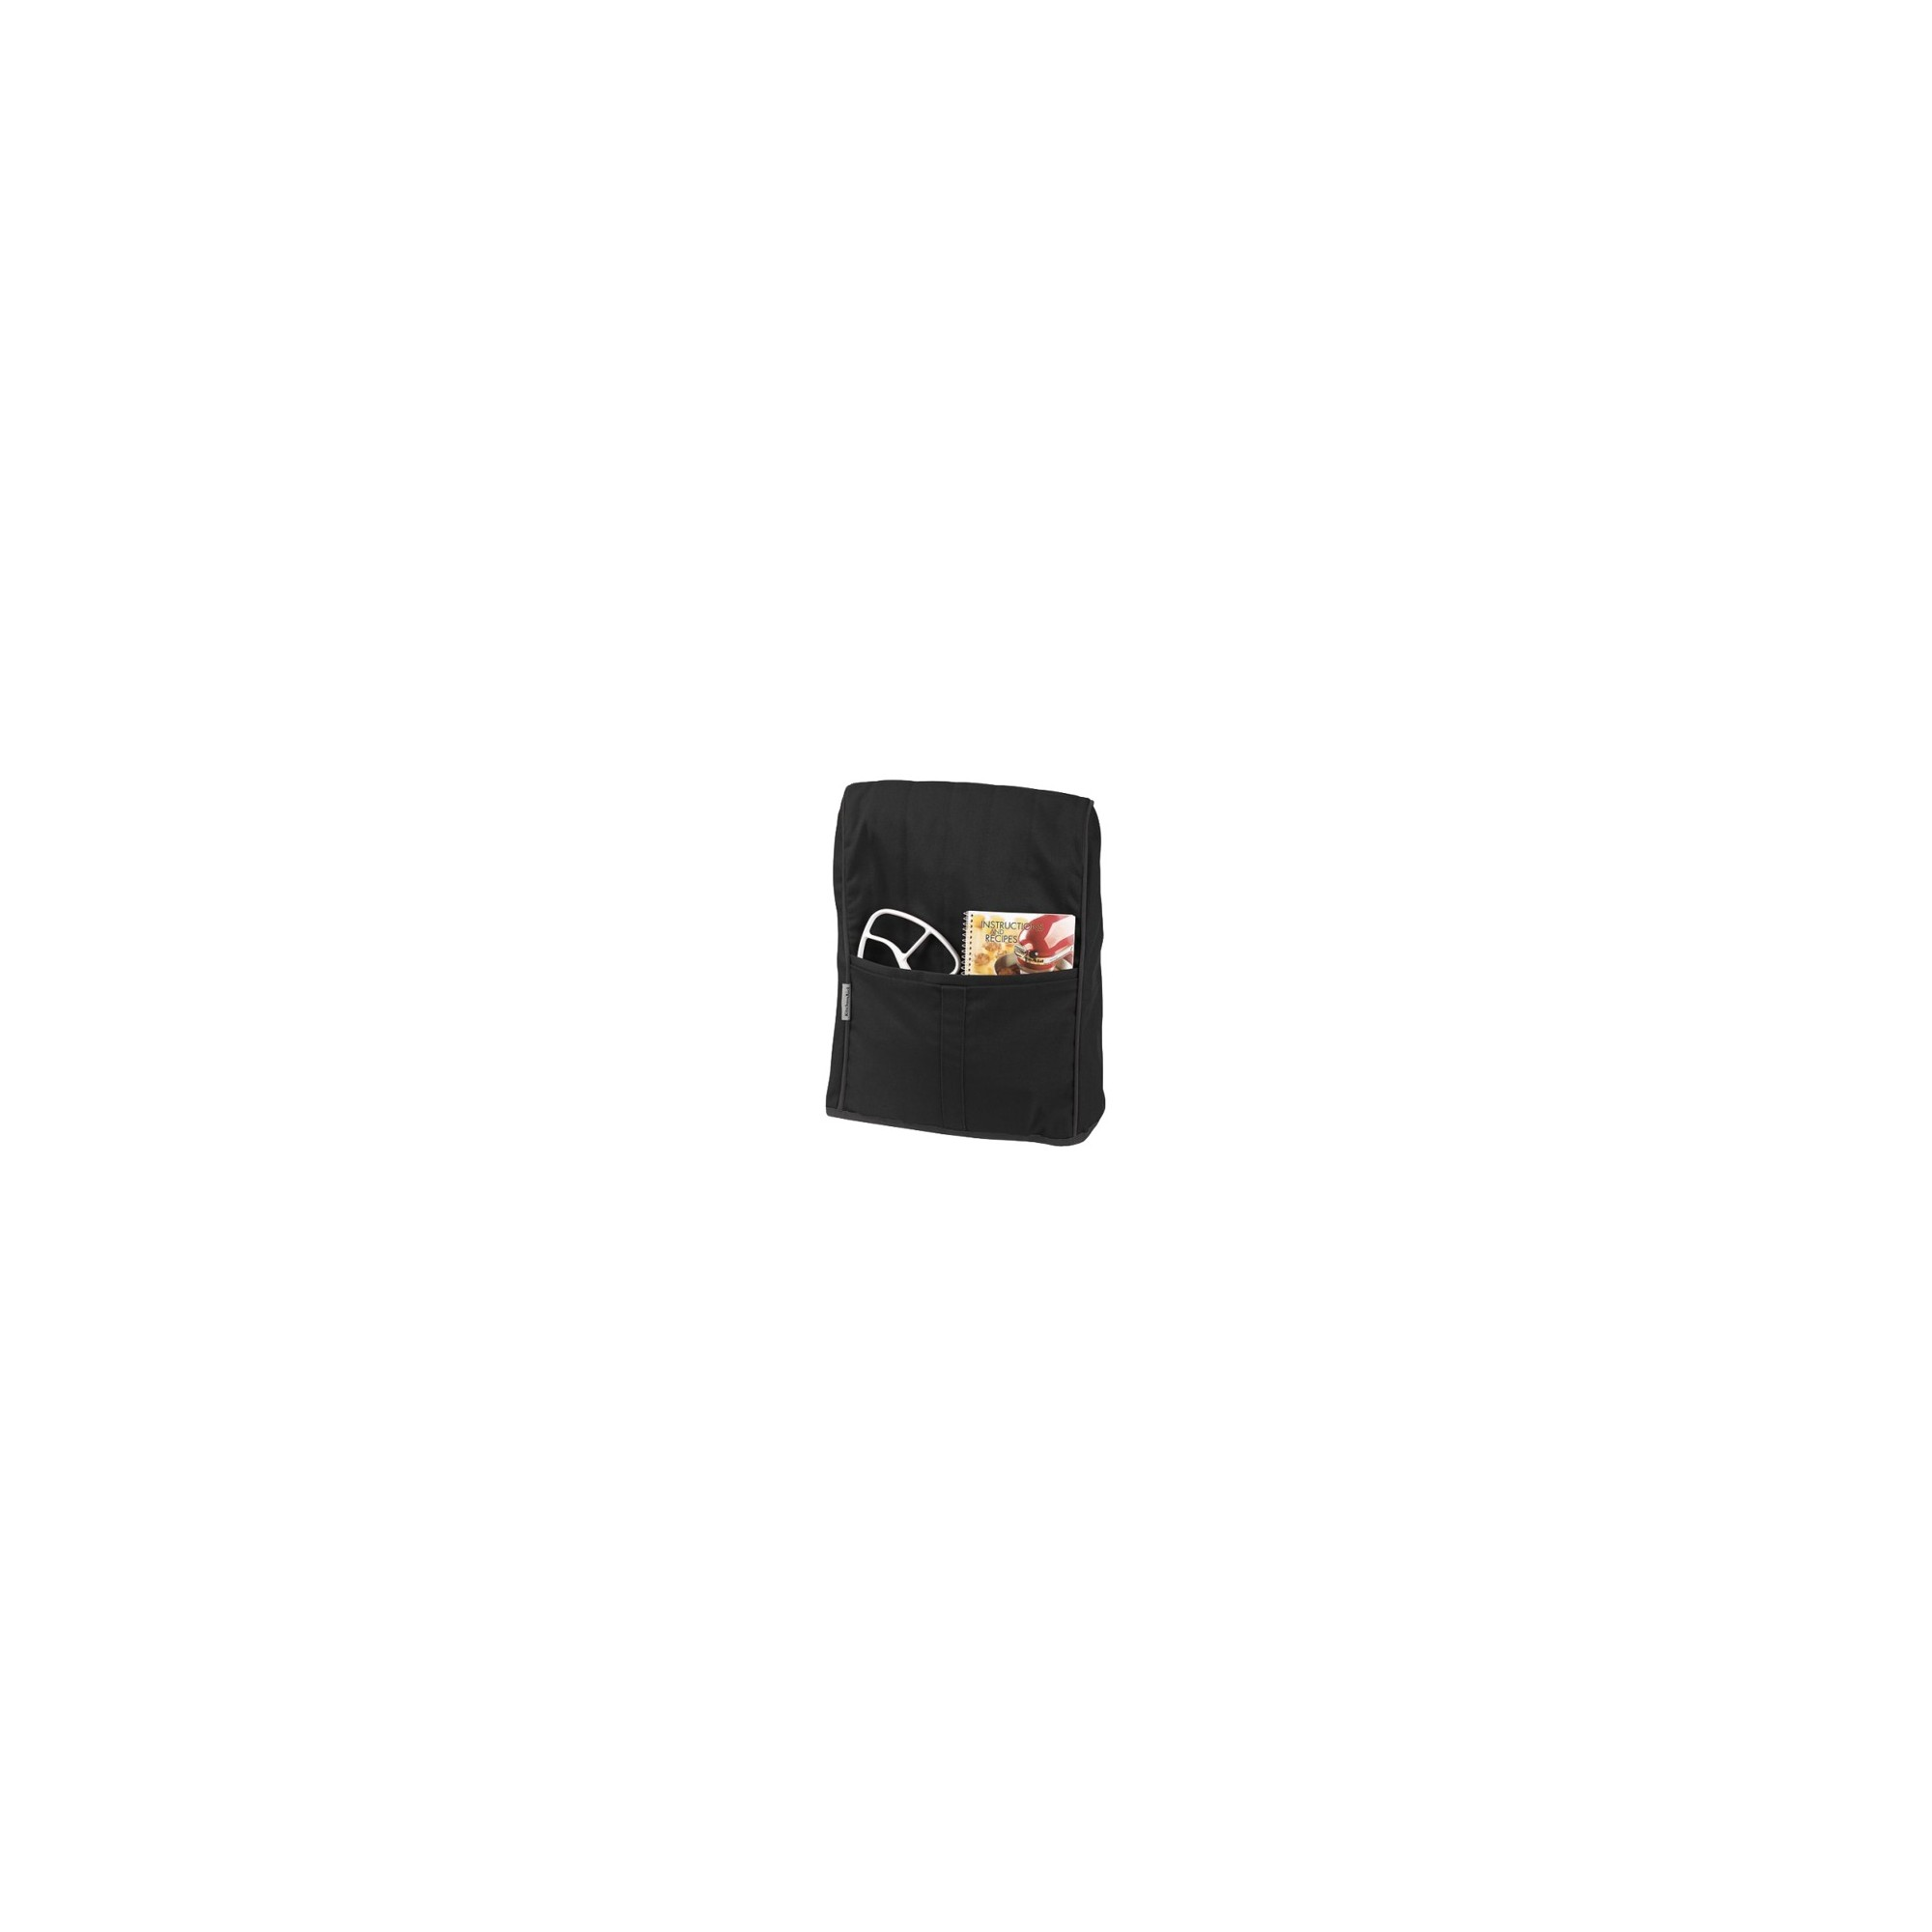 KitchenAid Stand Mixer Cloth Cover - KMCC1, Black